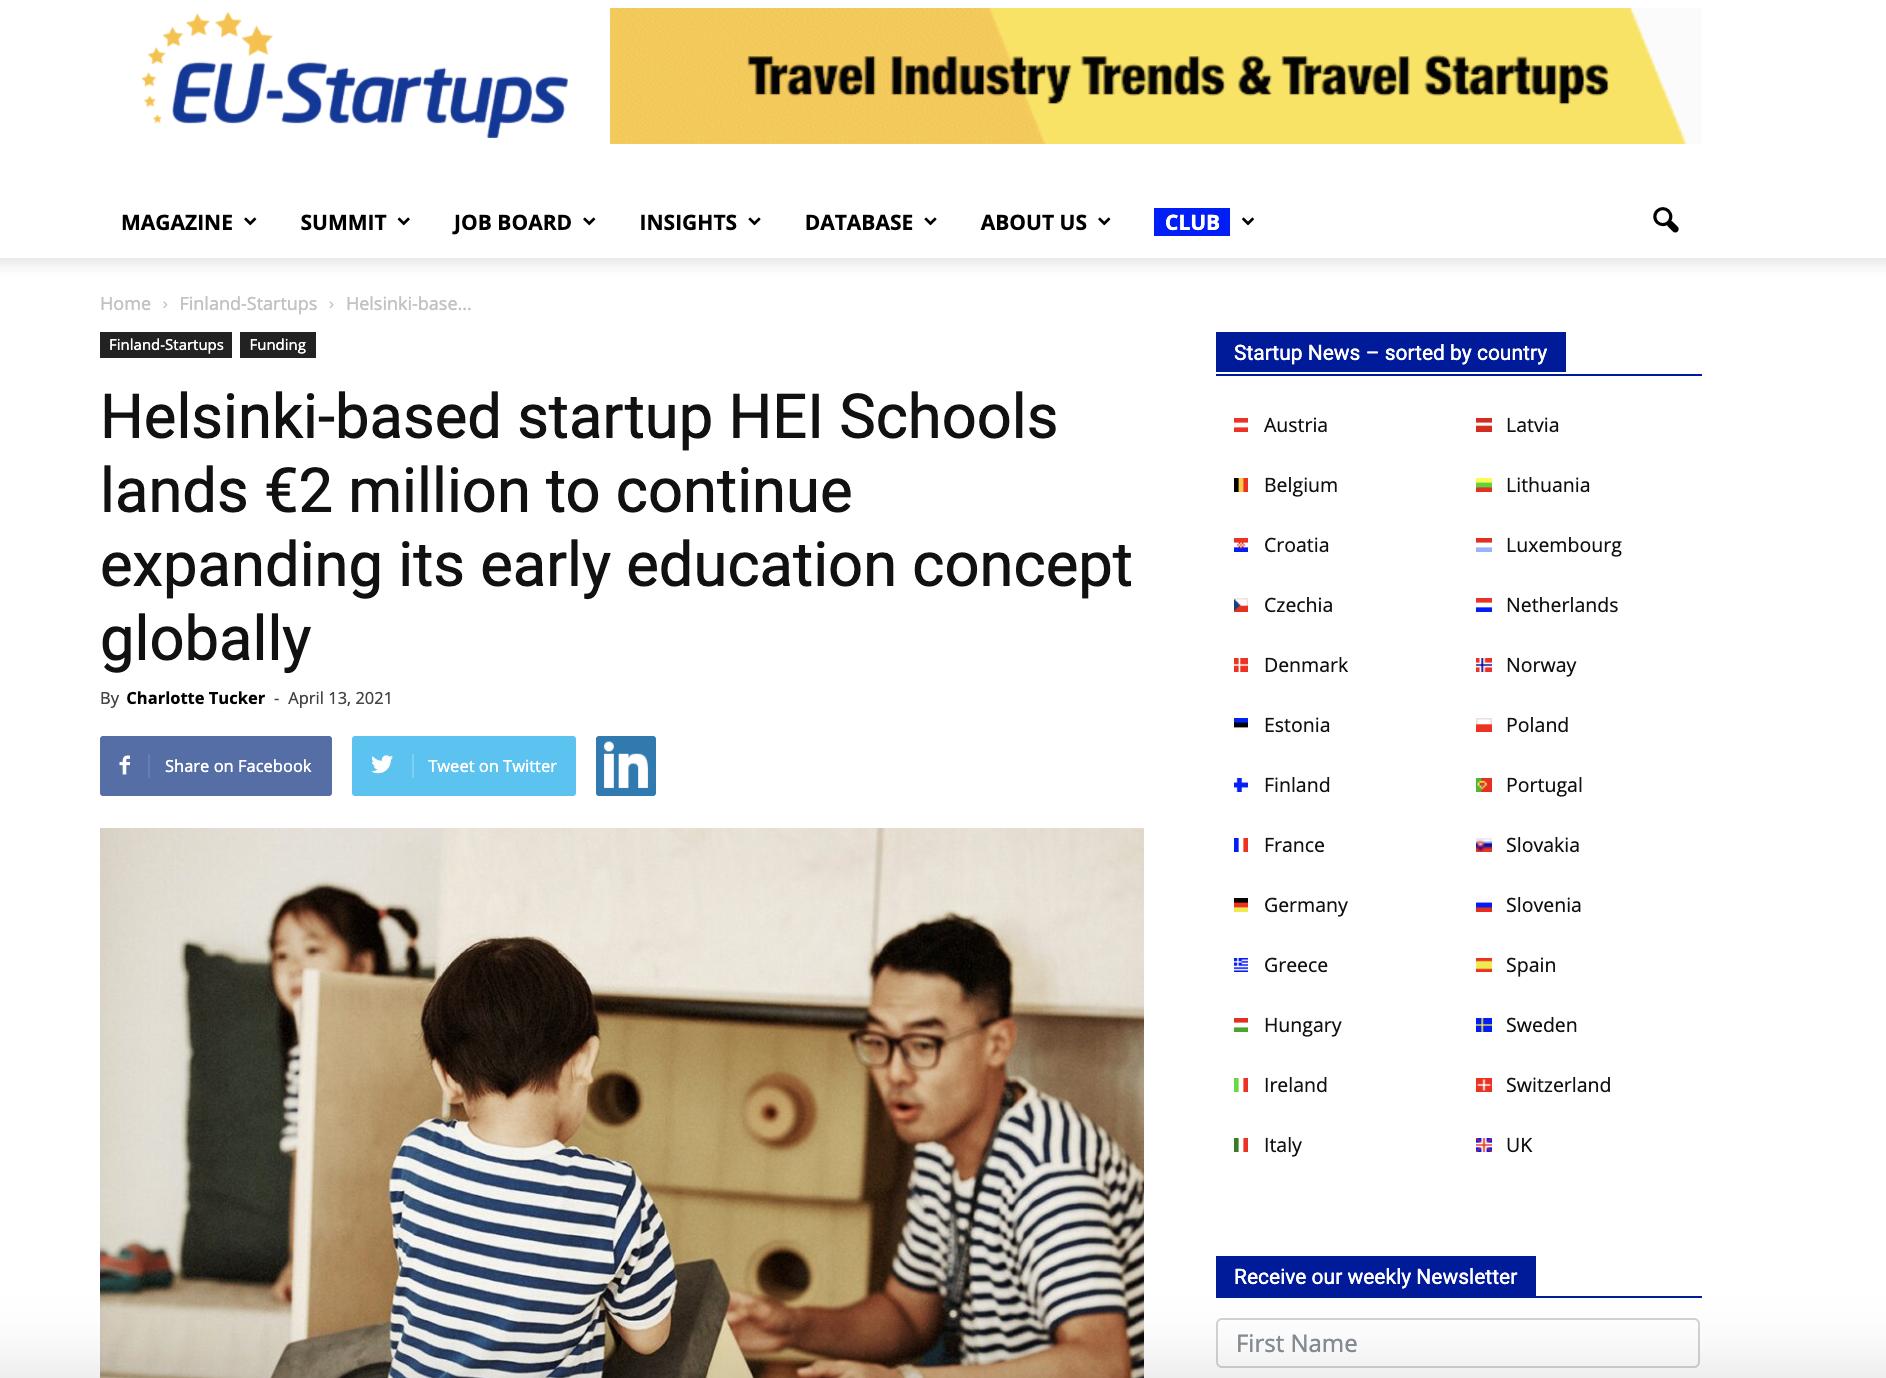 EU Startups Arricle April 2021